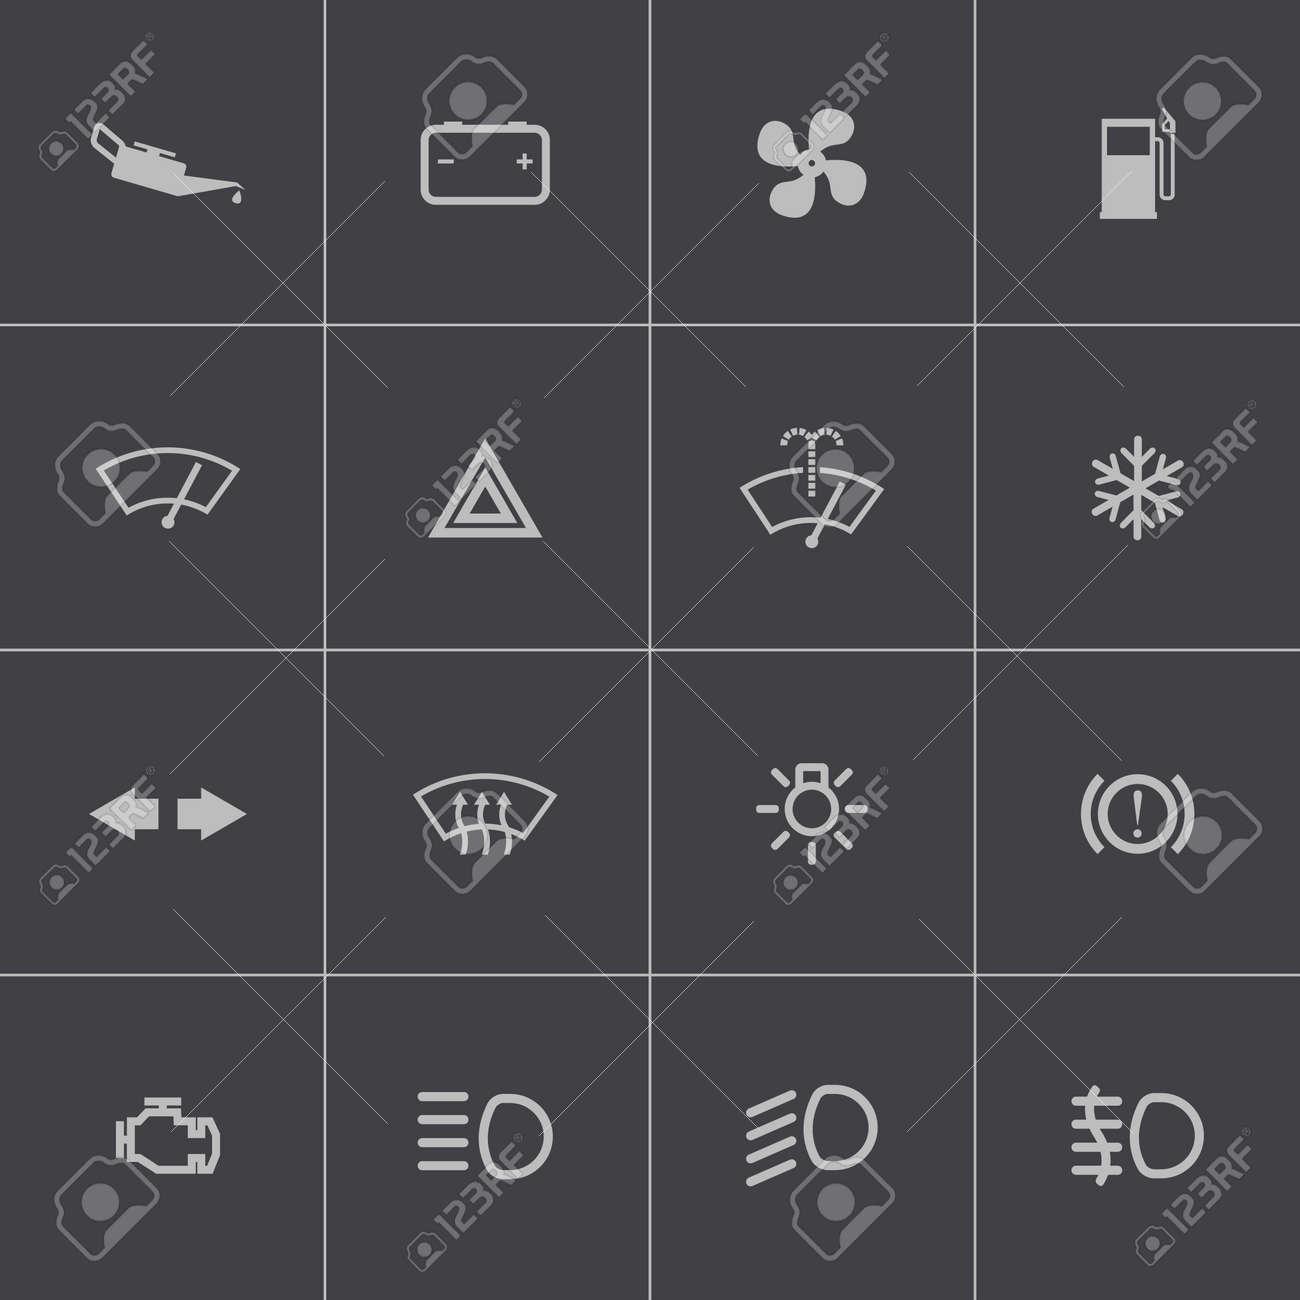 Vector Balck Car Dashboard Icons Set Royalty Free Cliparts - Car image sign of dashboardcar dashboard icons stock images royaltyfree imagesvectors